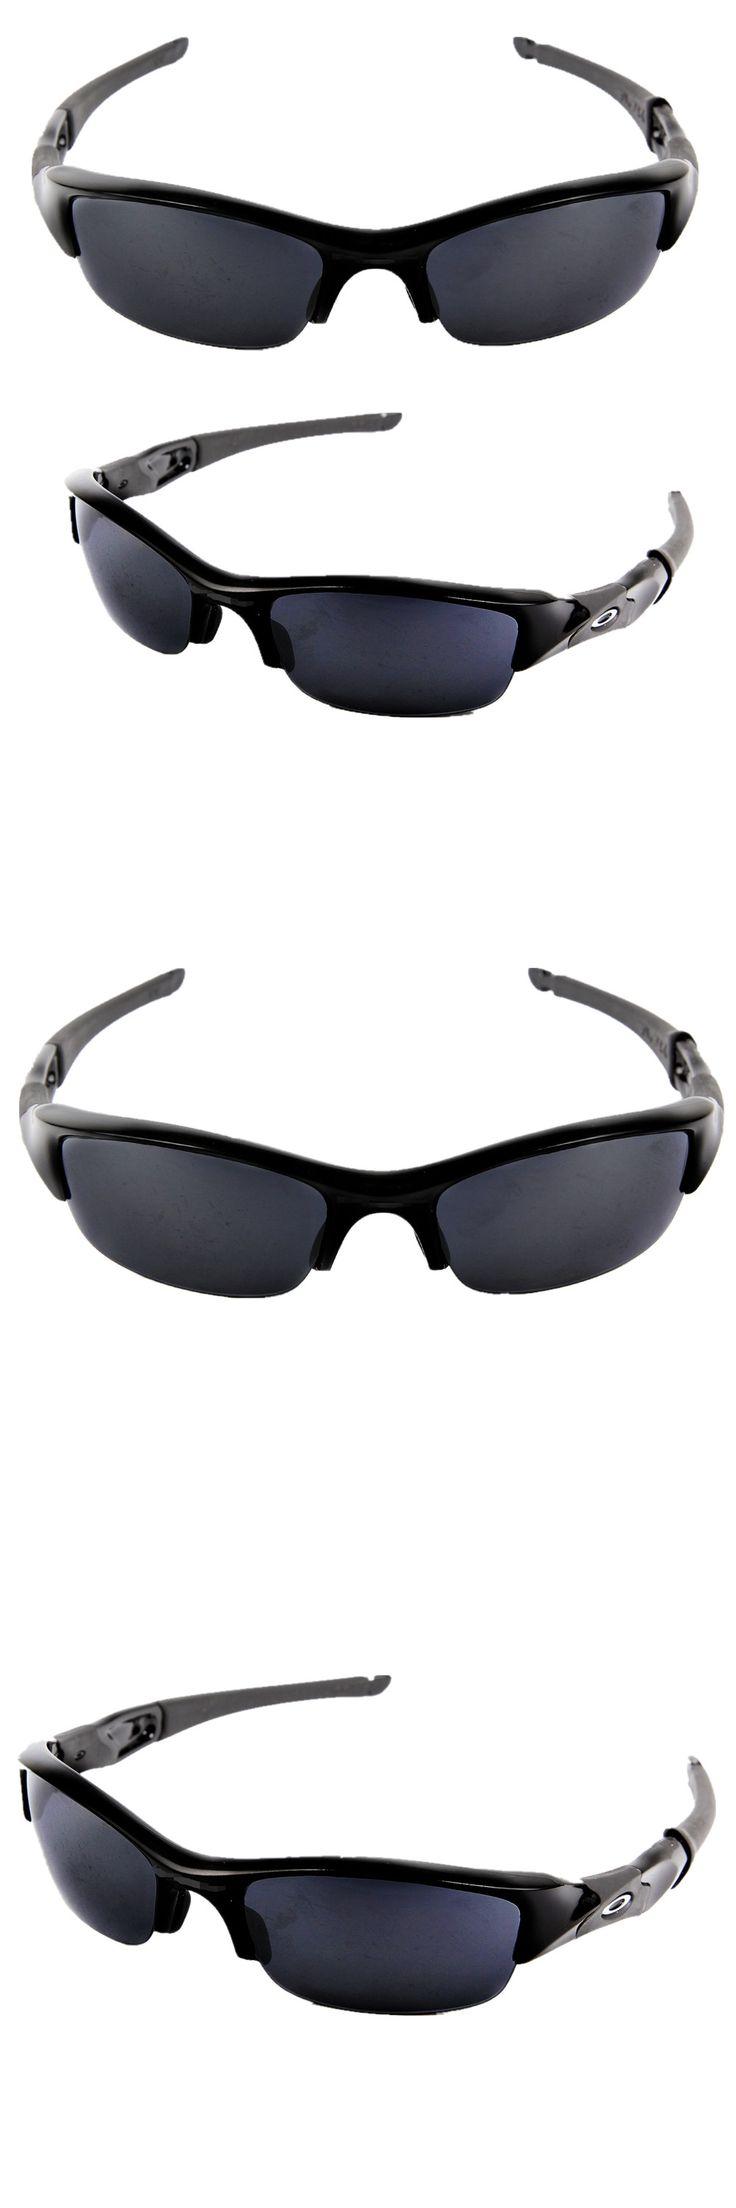 Inew Dark Grey Black polarized Replacement Lenses for  Flak Jacket